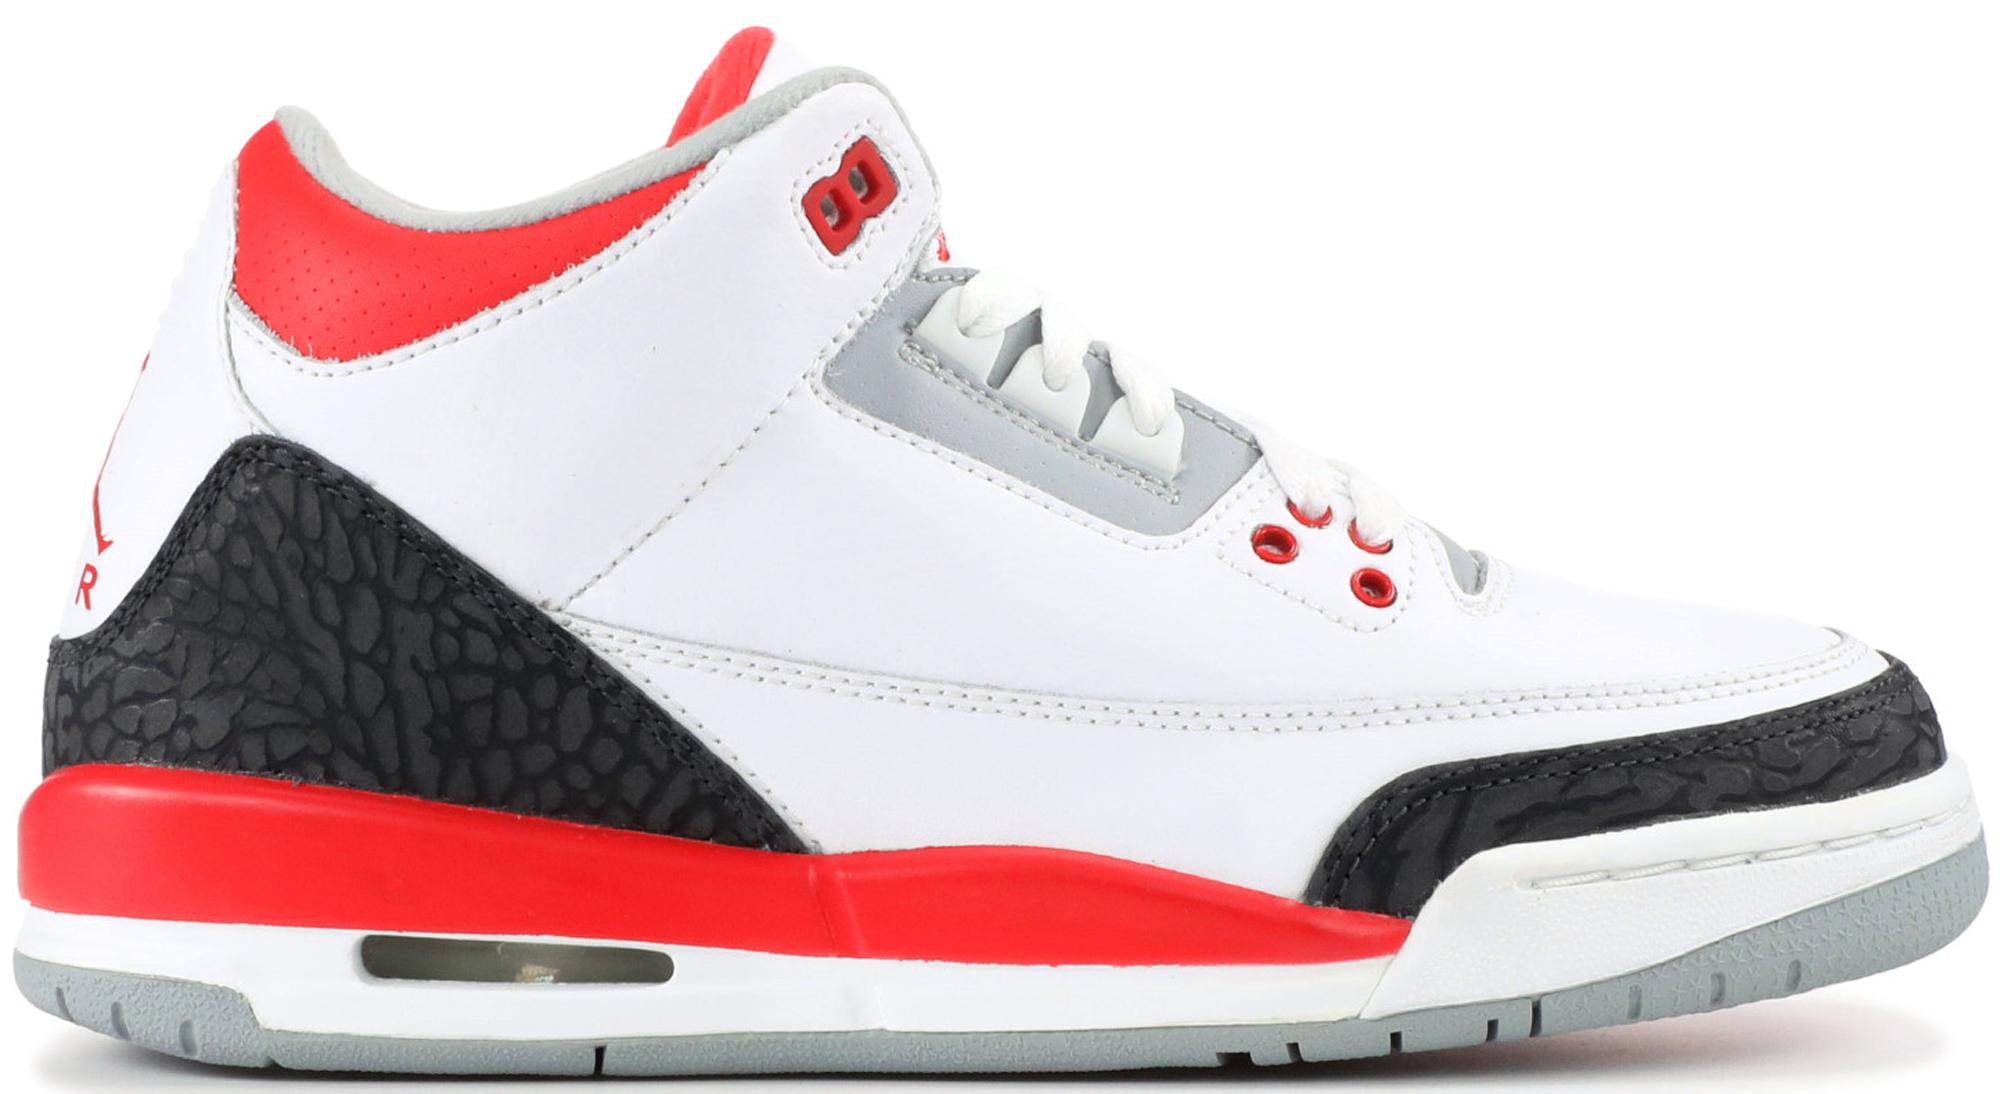 Jordan 3 Retro Fire Red 2007 (GS